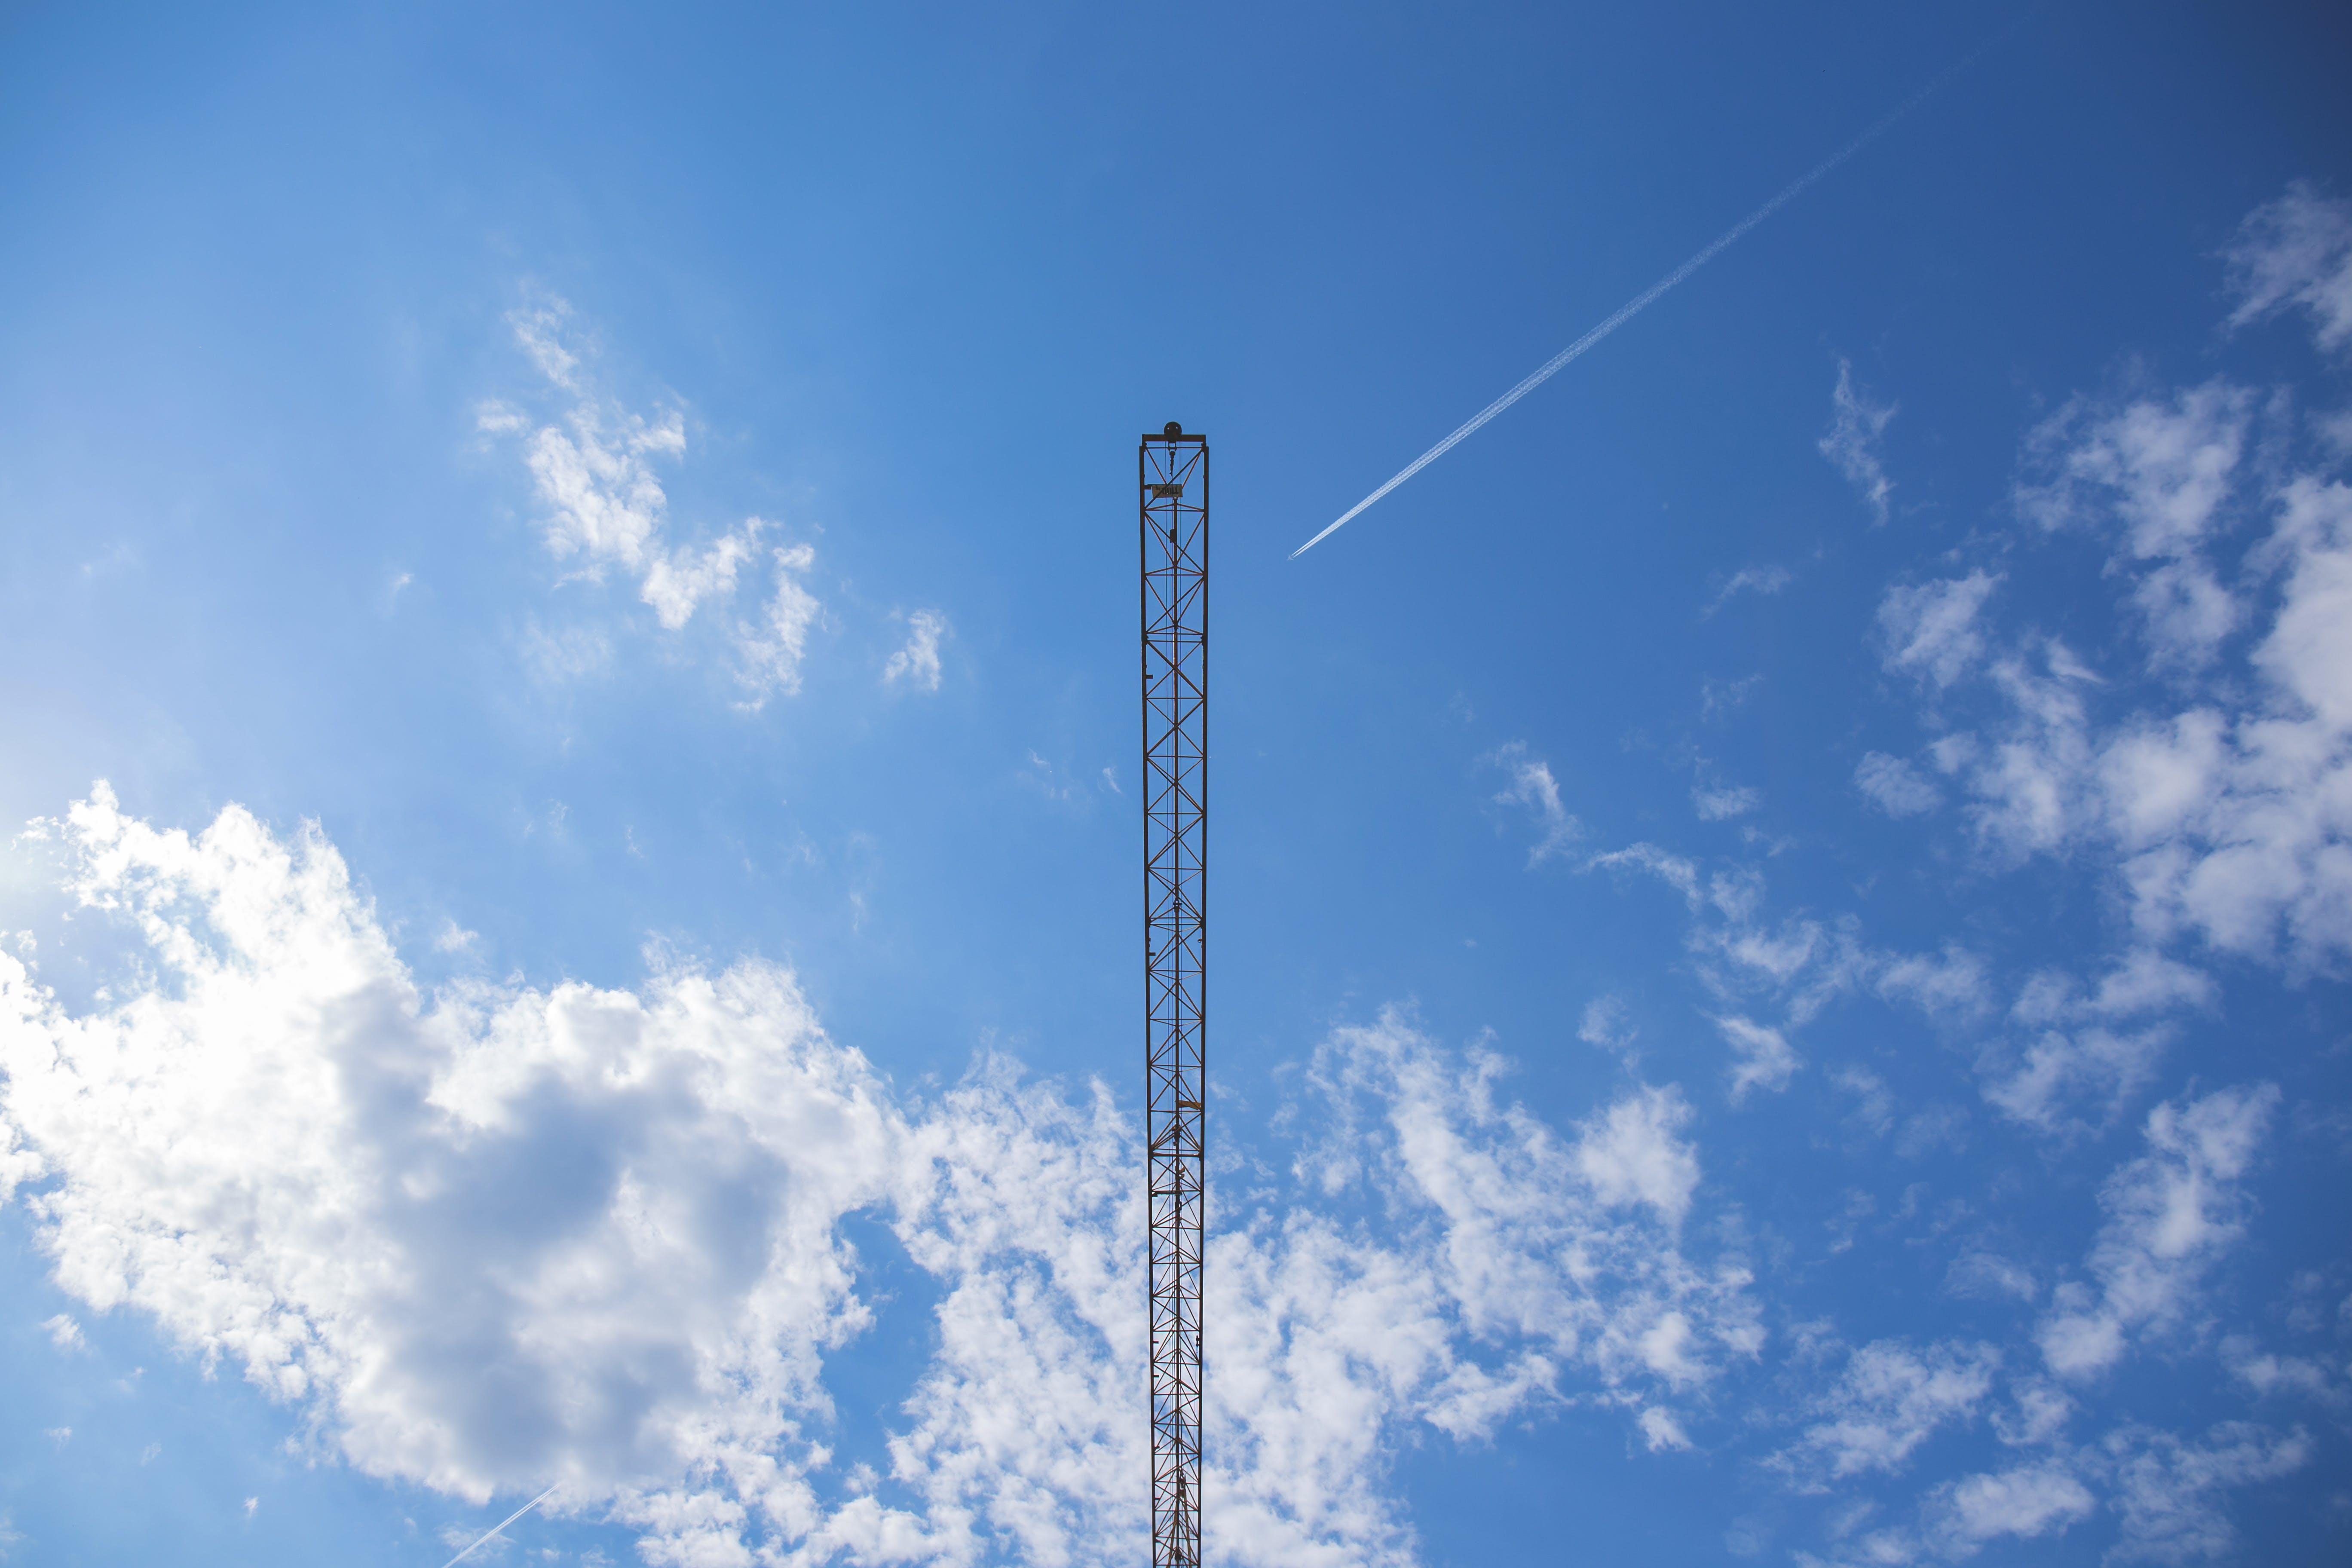 Black Tower Under Blue Sky during Daytime